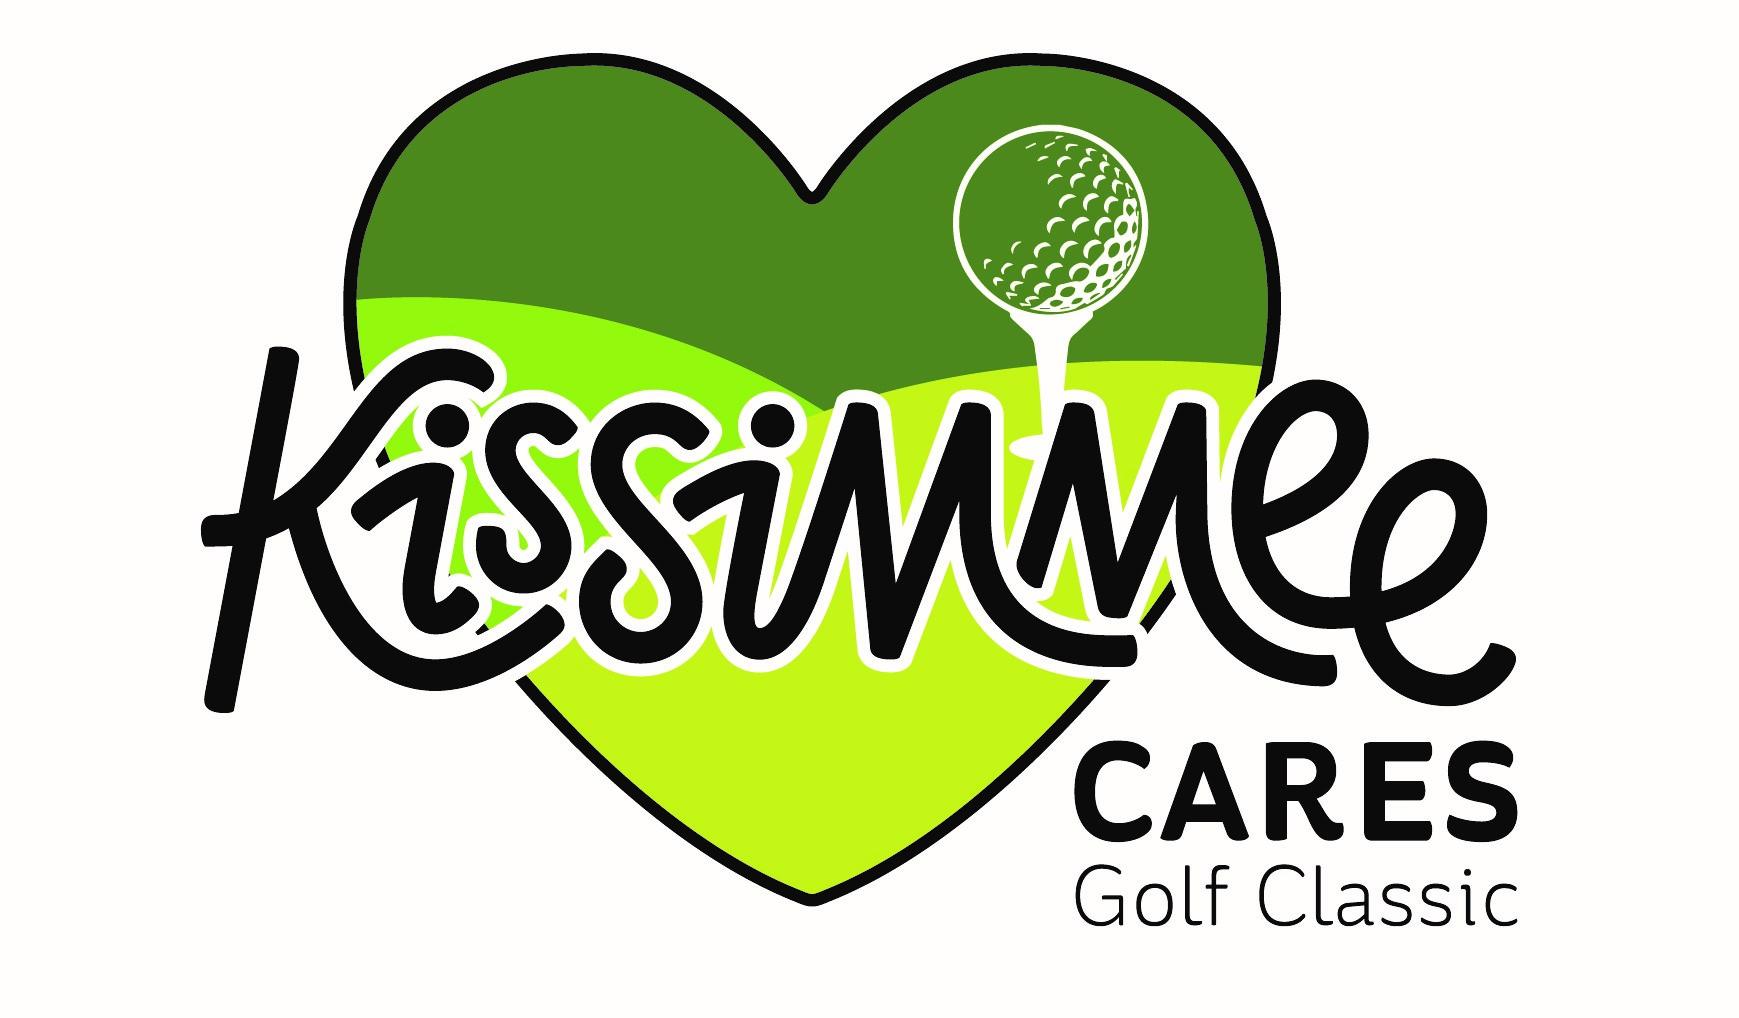 Kissimmee Cares Golf Classic Logo